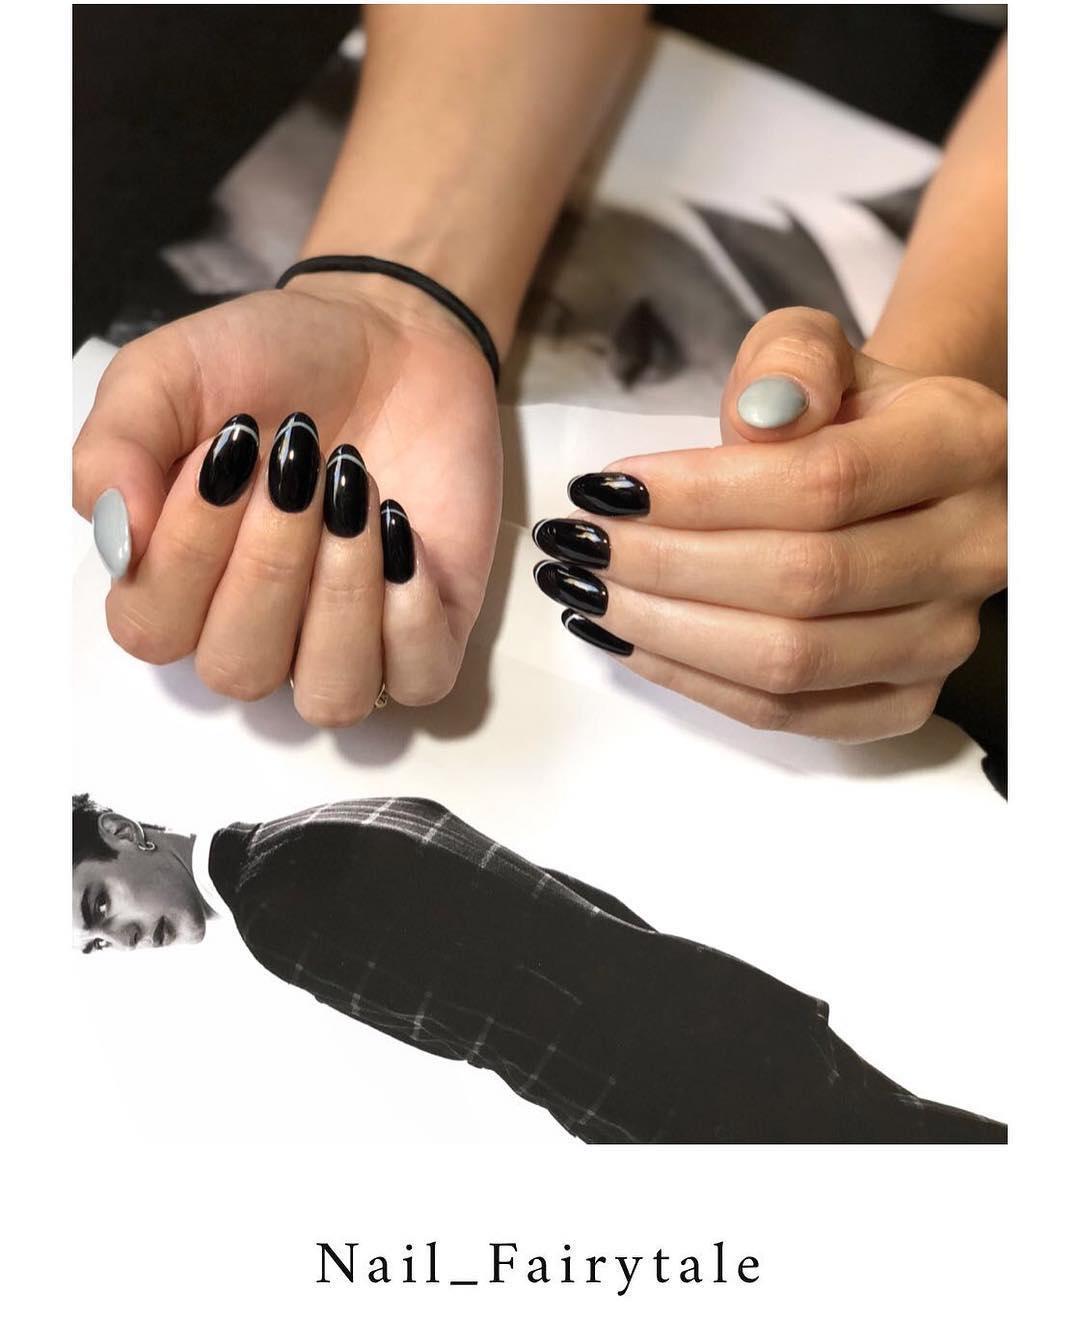 elegant black nail designs 2019 6 - Elegant Black Nail Designs 2019